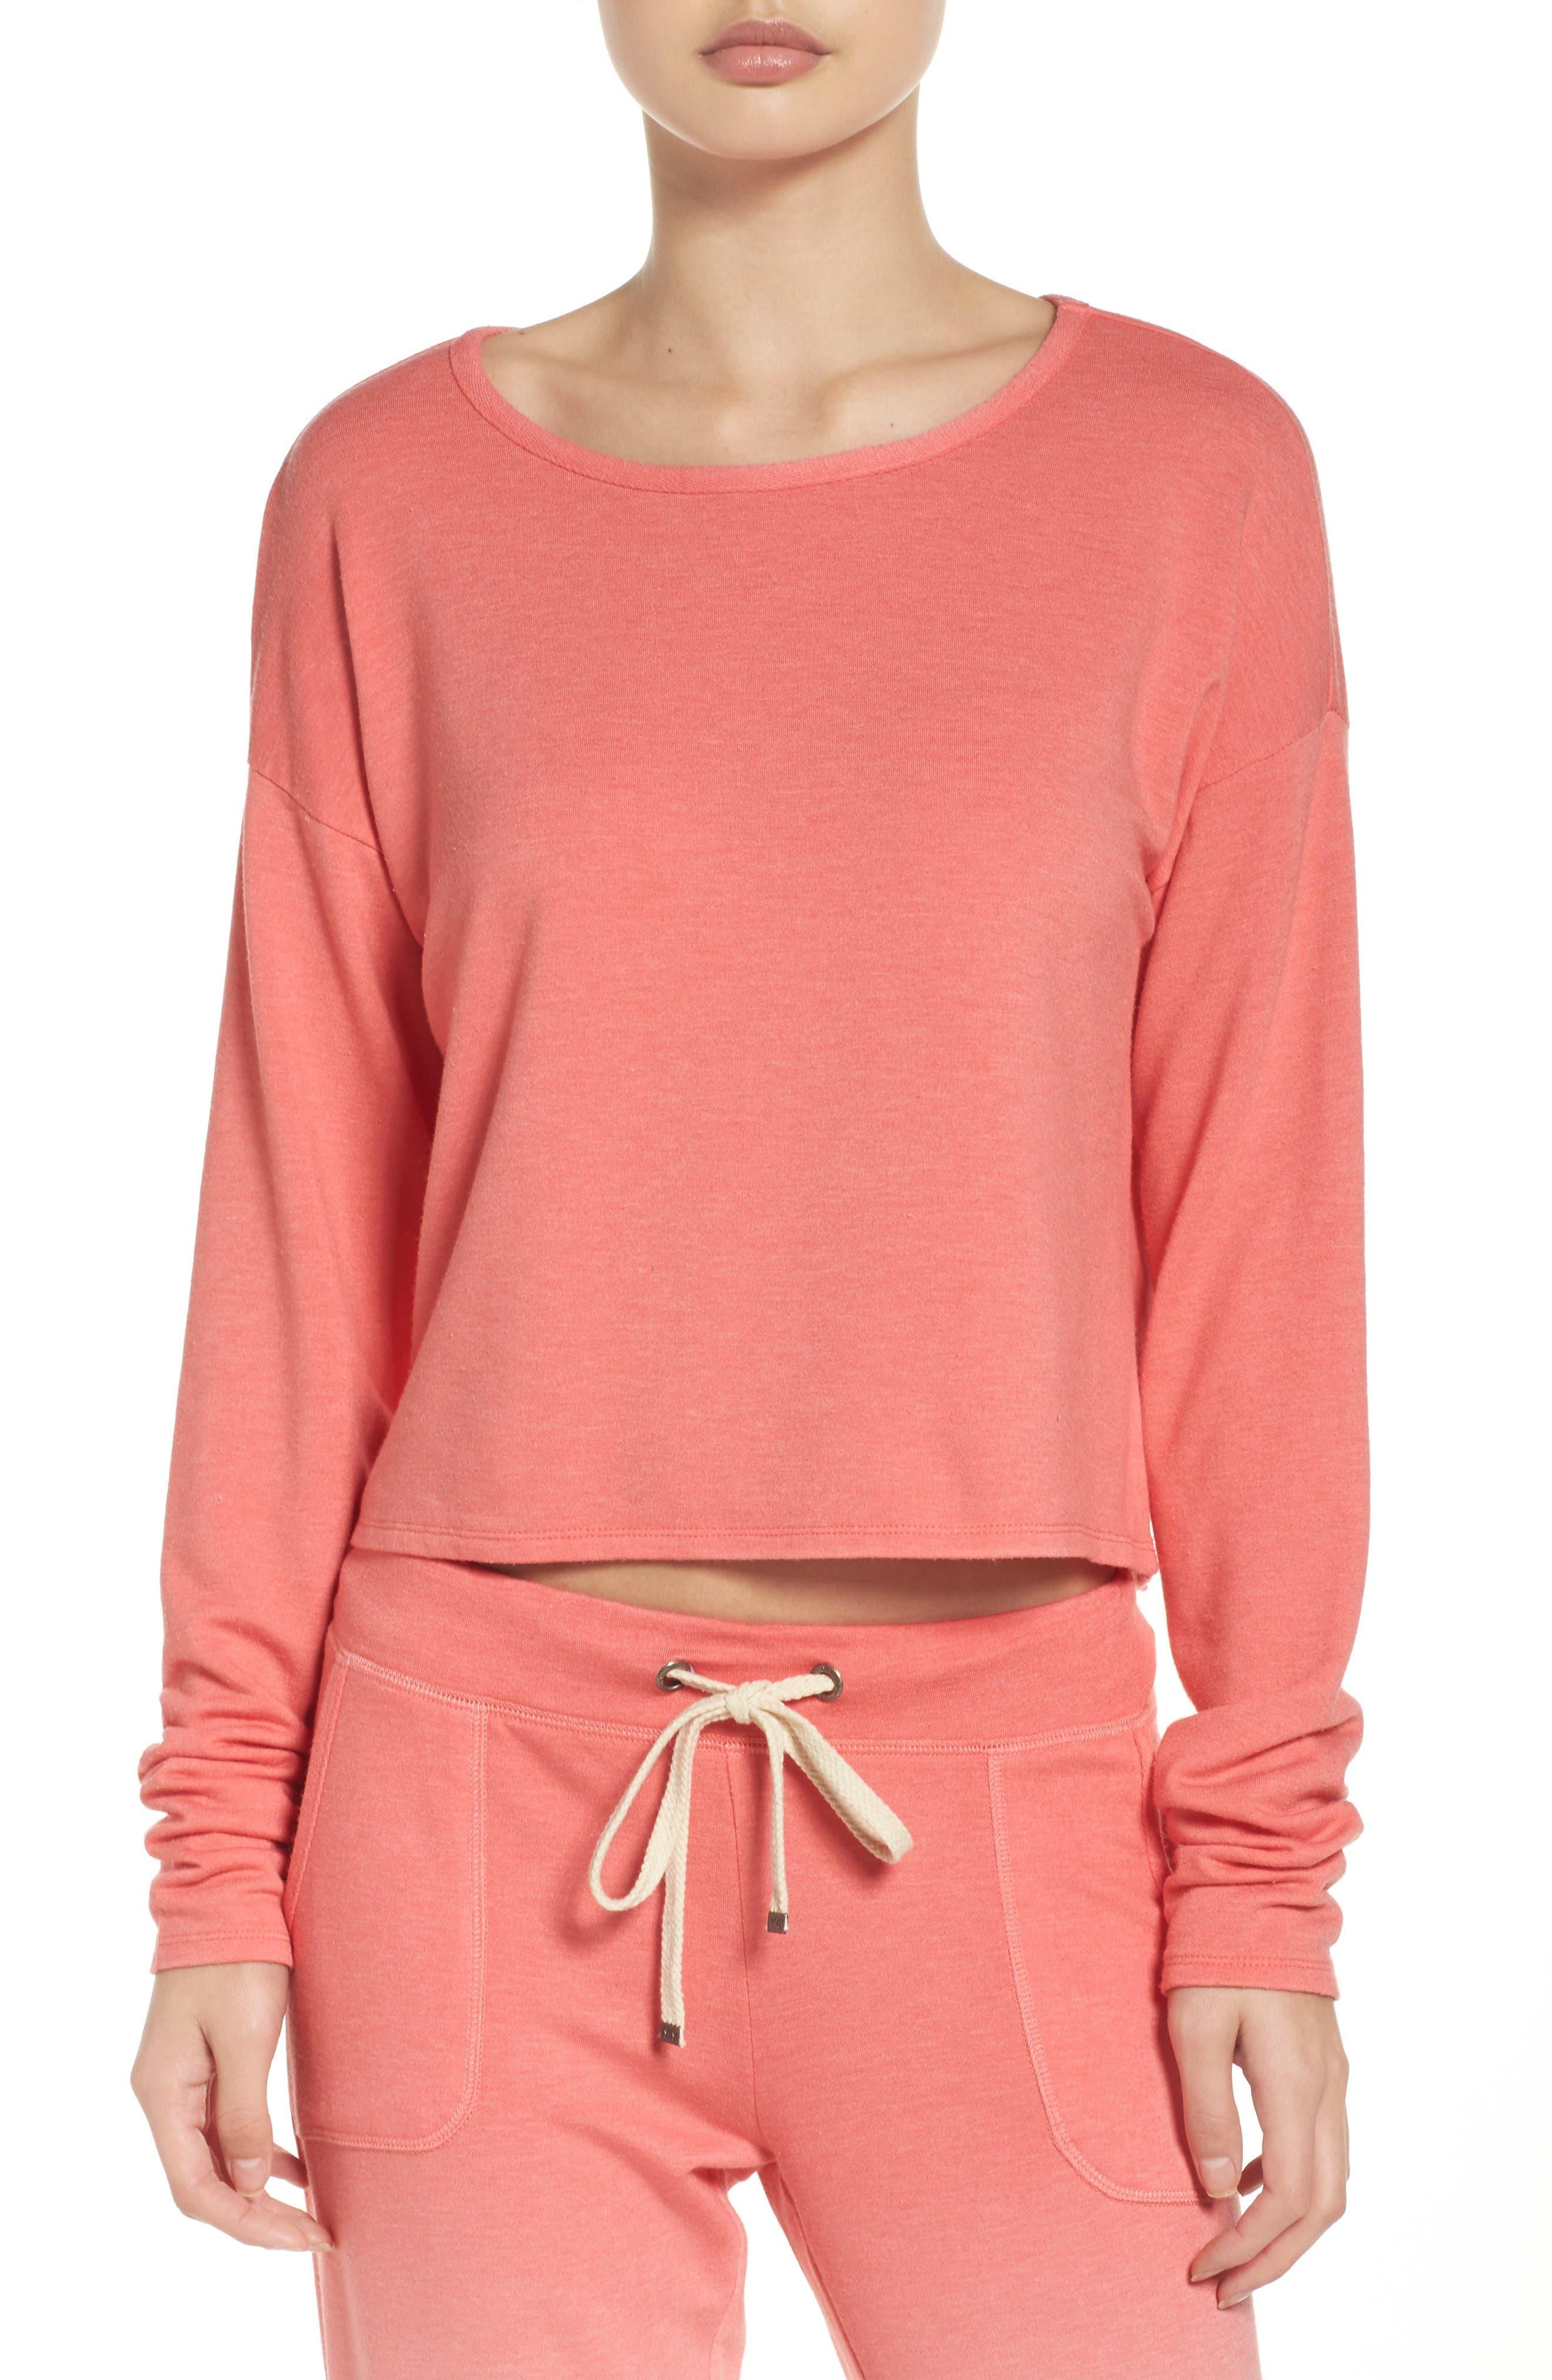 Main Image - Make + Model Sunrise Sweatshirt